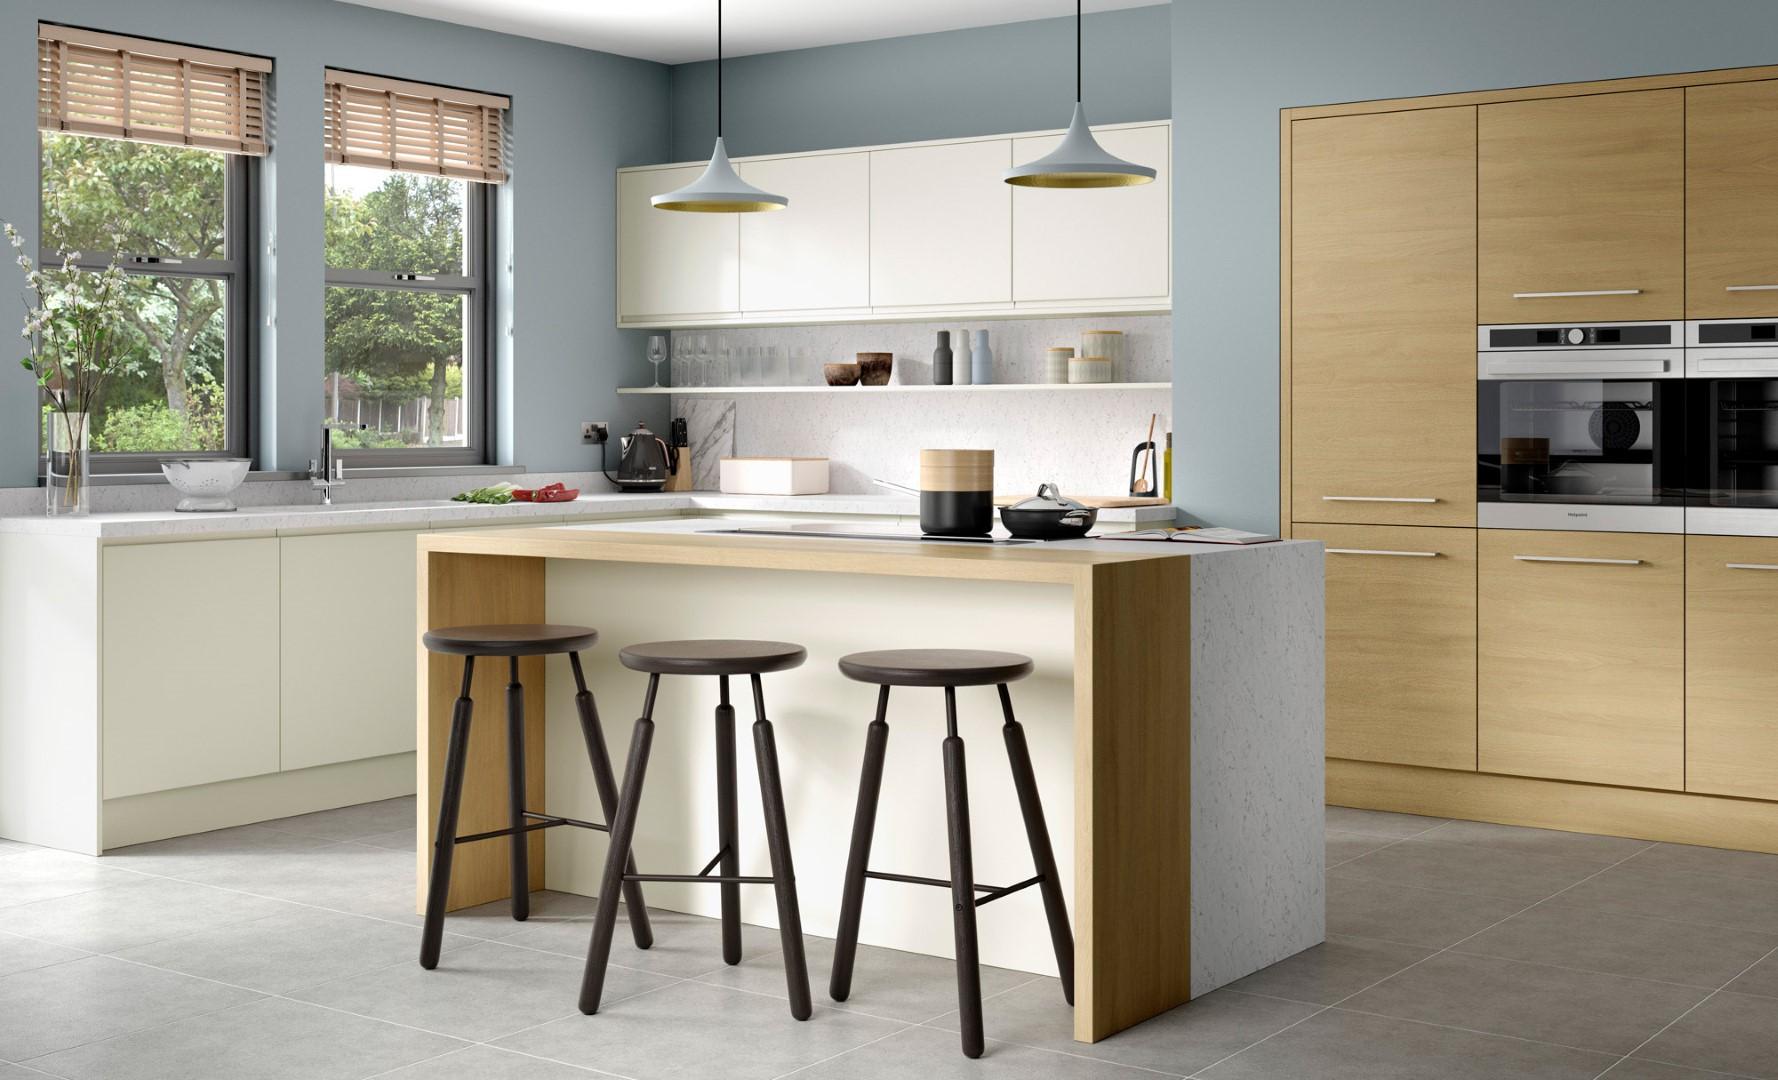 Modern Contemporary Strada Matte Porcelain, Tavola Light Oak - Kitchen Design - Alan Kelly Kitchens - Waterford